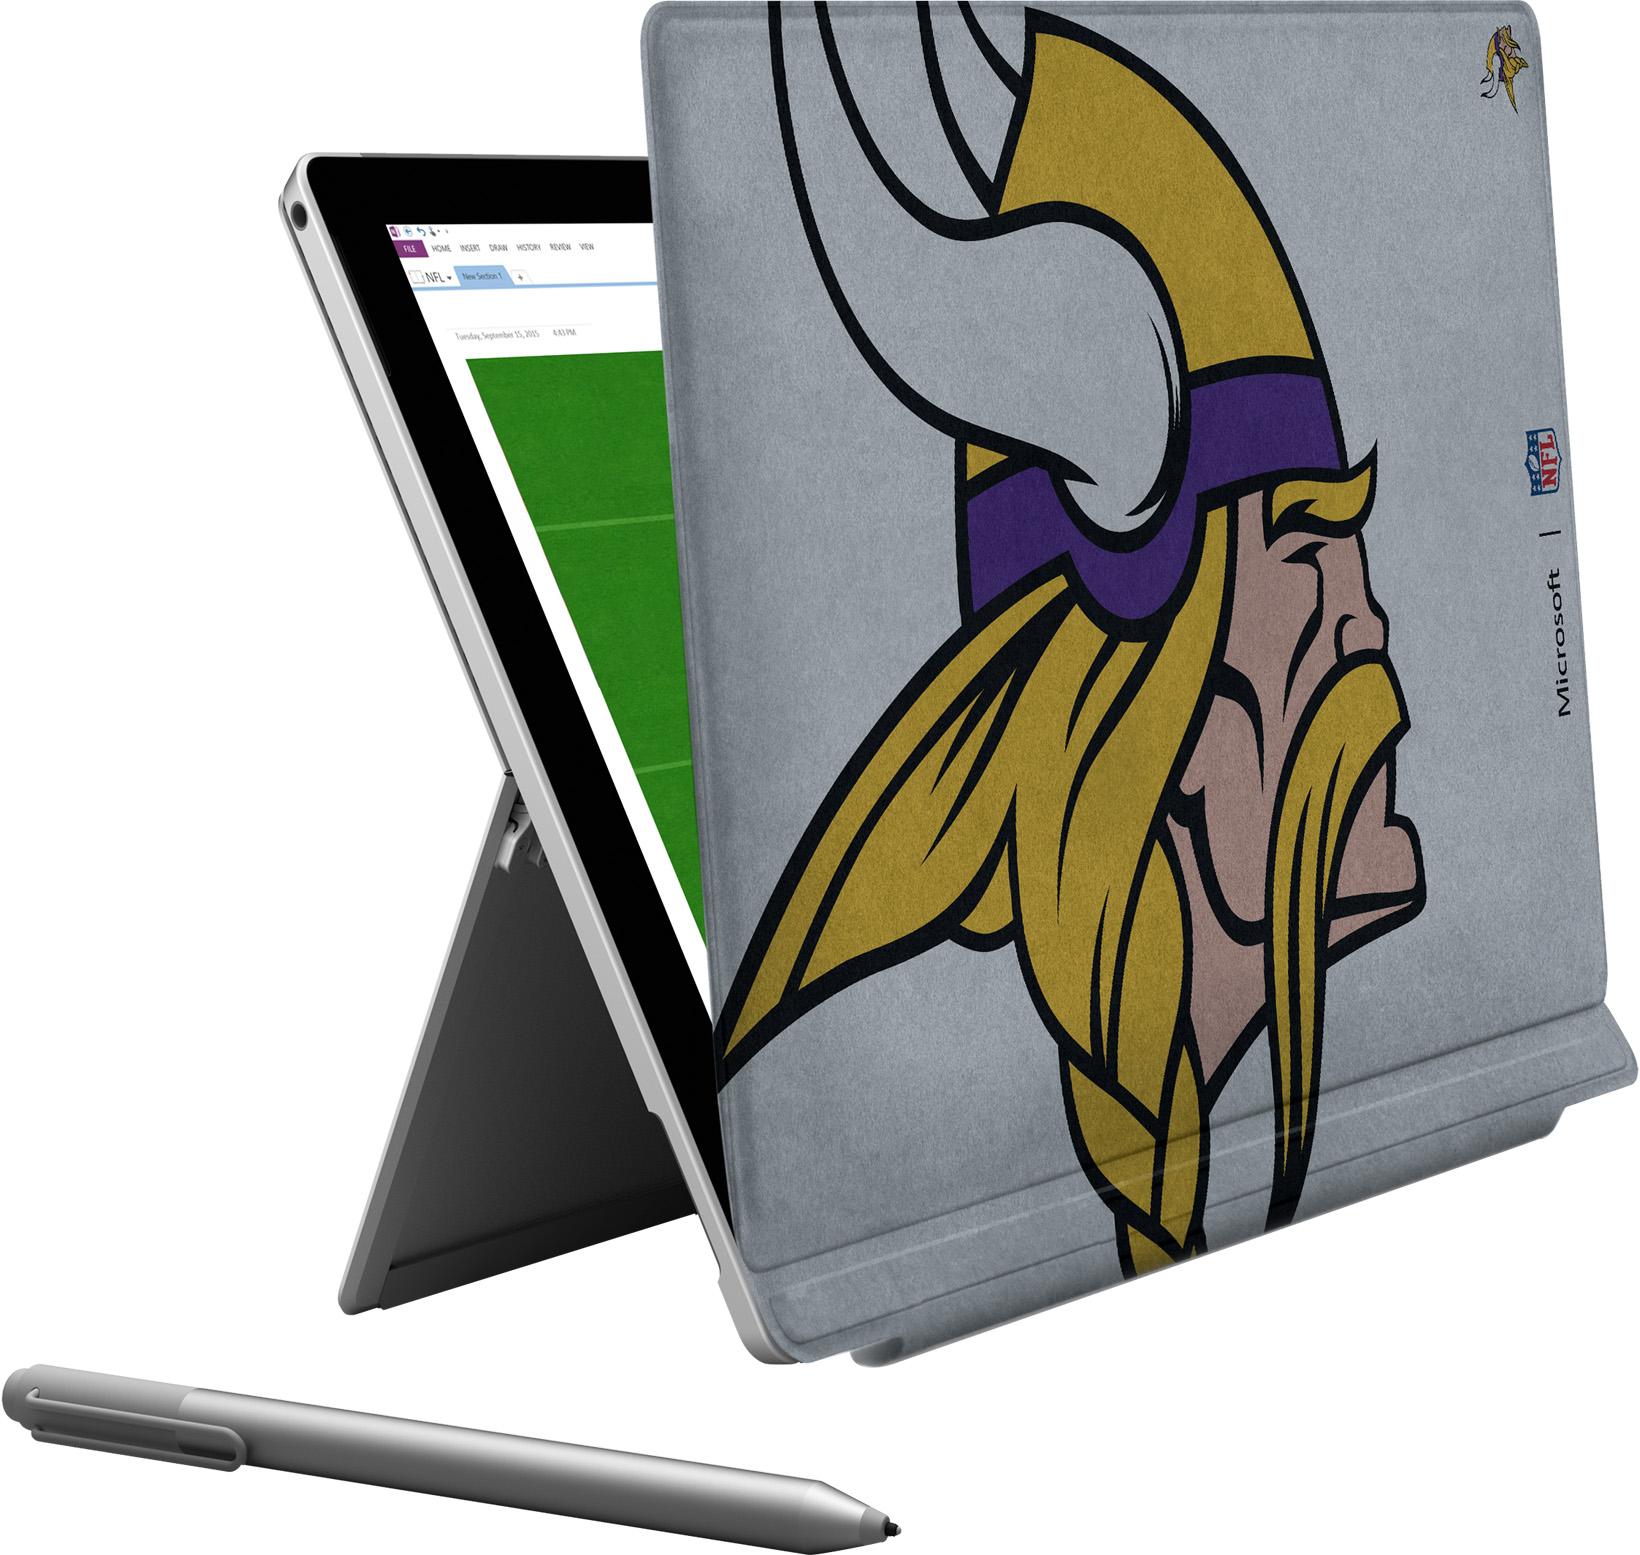 Microsoft Surface Pro 4 Minnesota Vikings Type Cover